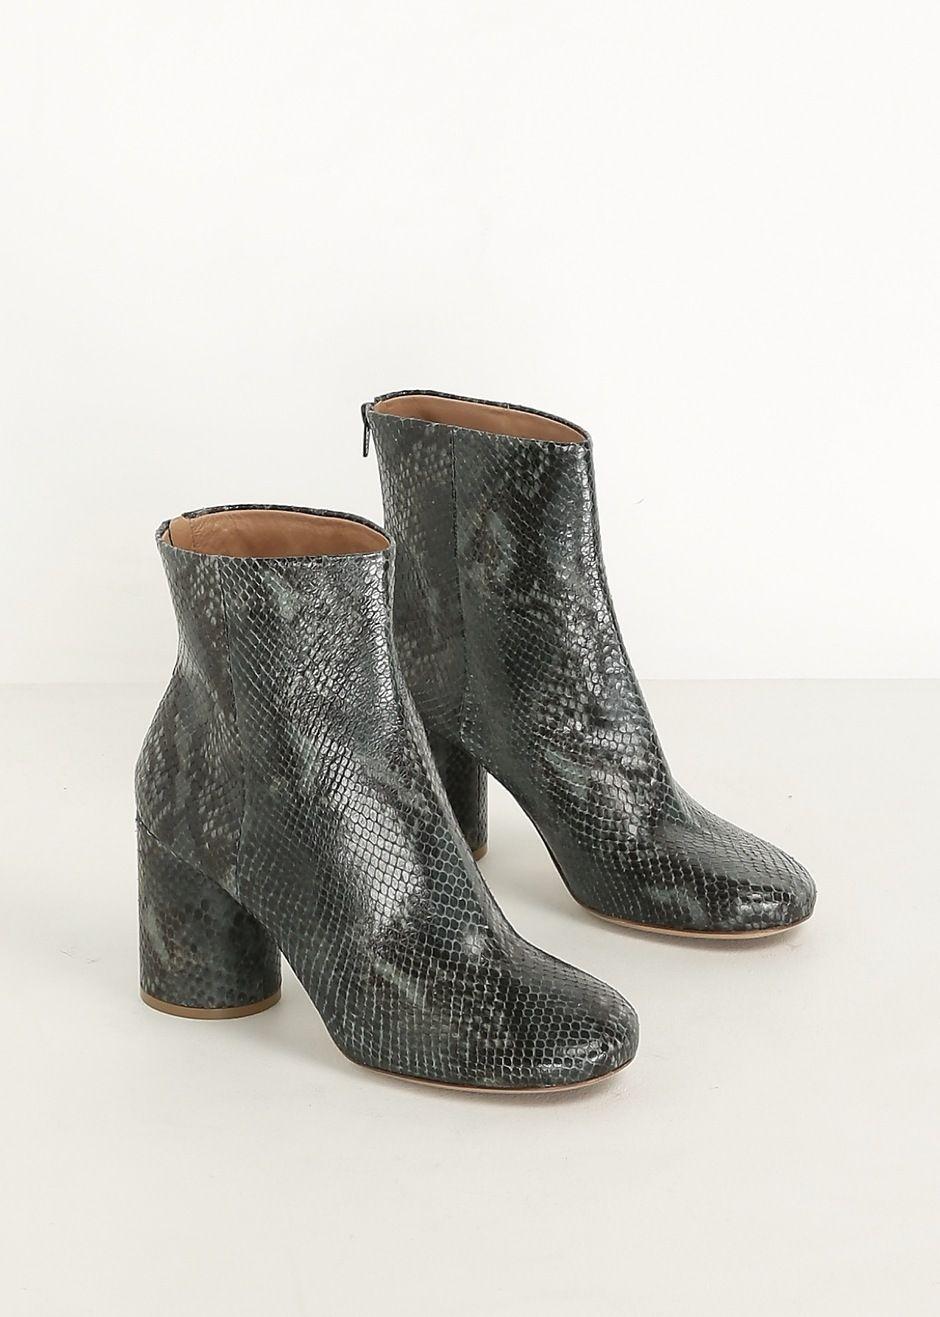 f34fbf82230 Maison Martin Margiela Snake Printed Ankle Boot (Dark Green ...